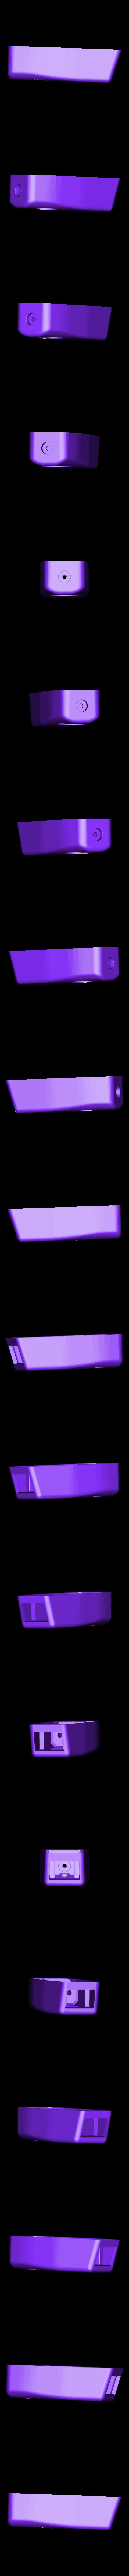 eolienne_2_nacelle_inf.STL Download free STL file Eolienne Wind turbine • 3D printing model, lulu3Dbuilder